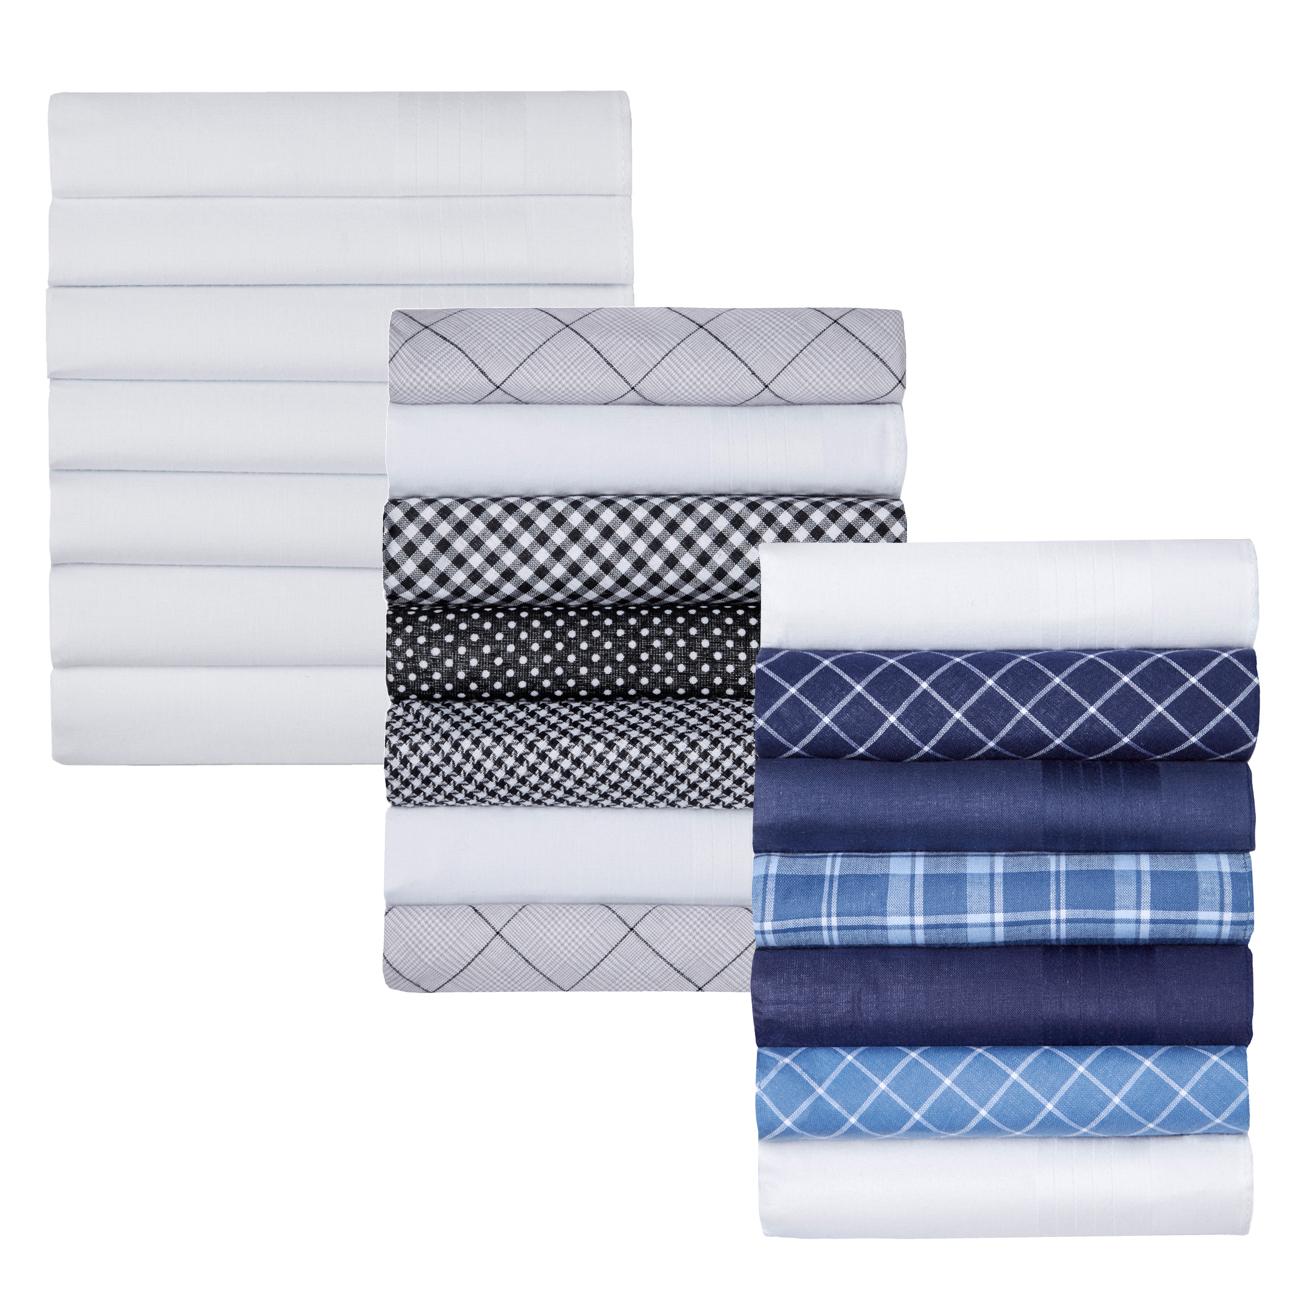 ! 7 BOX Men's 100/% Cotton Tartan 7 Handkerchiefs In Gift Box